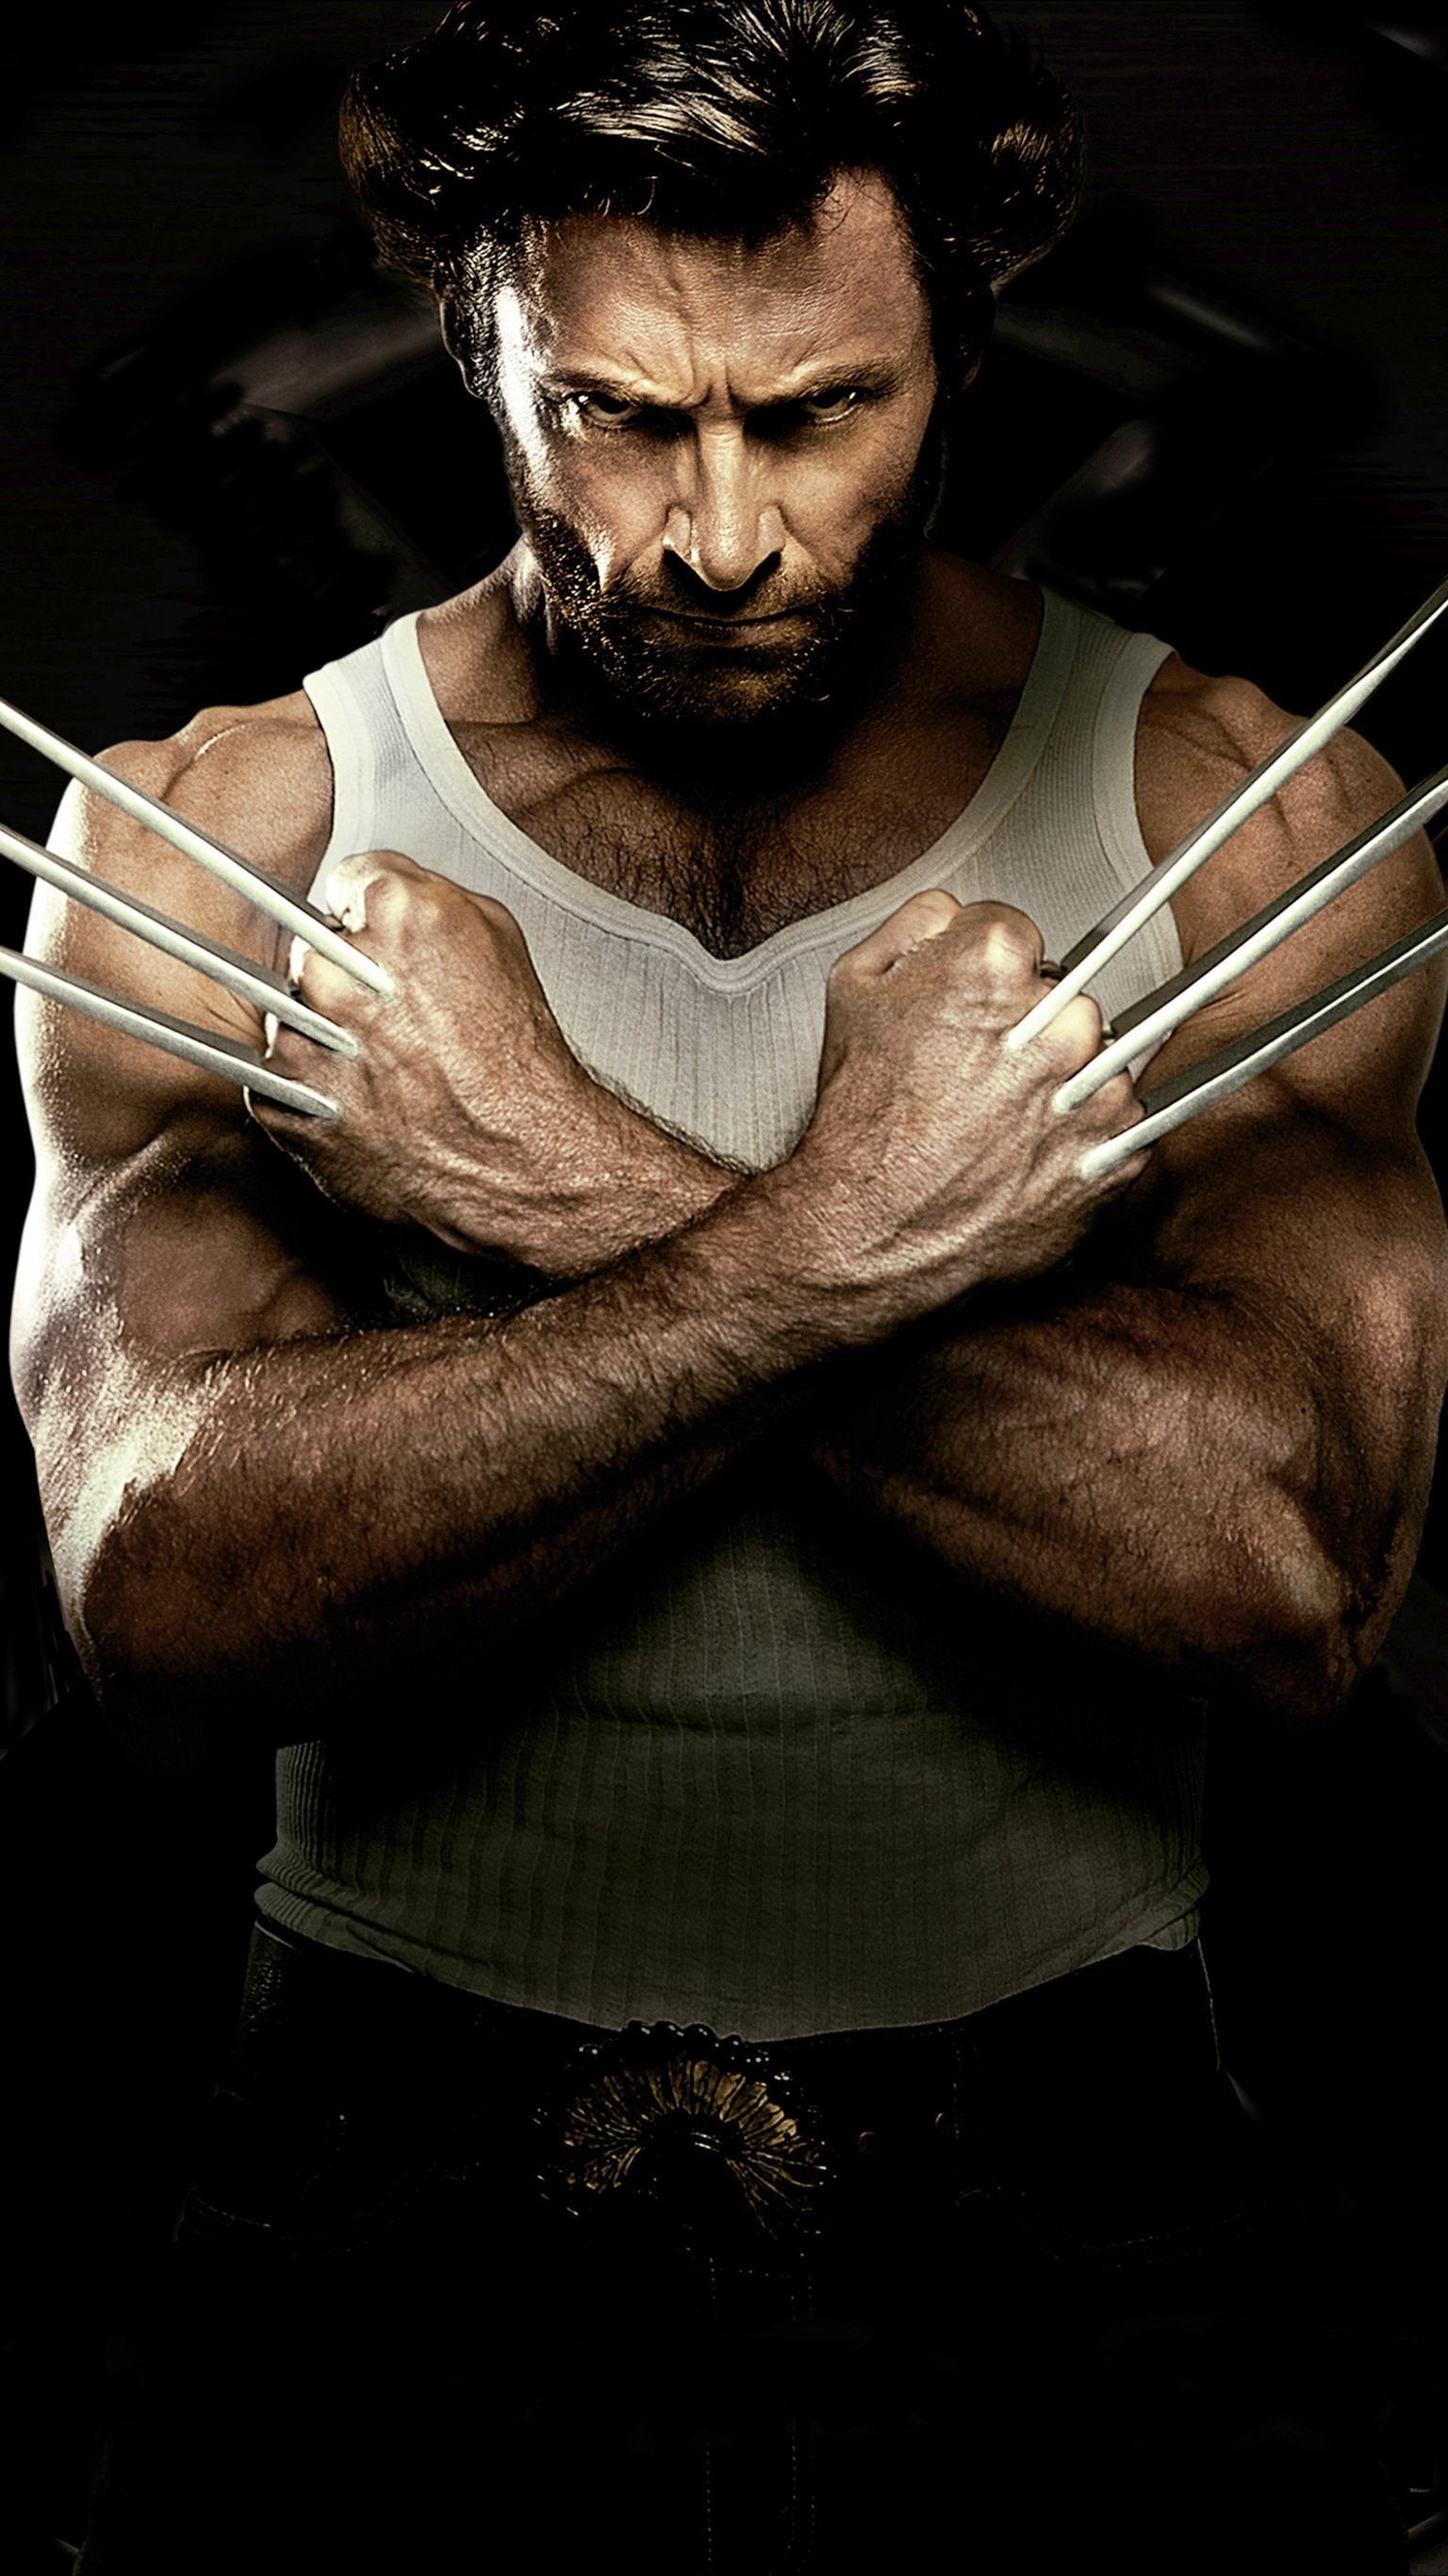 X Men Origins Wolverine 2009 Phone Wallpaper Phone wallpaper 1536x2732